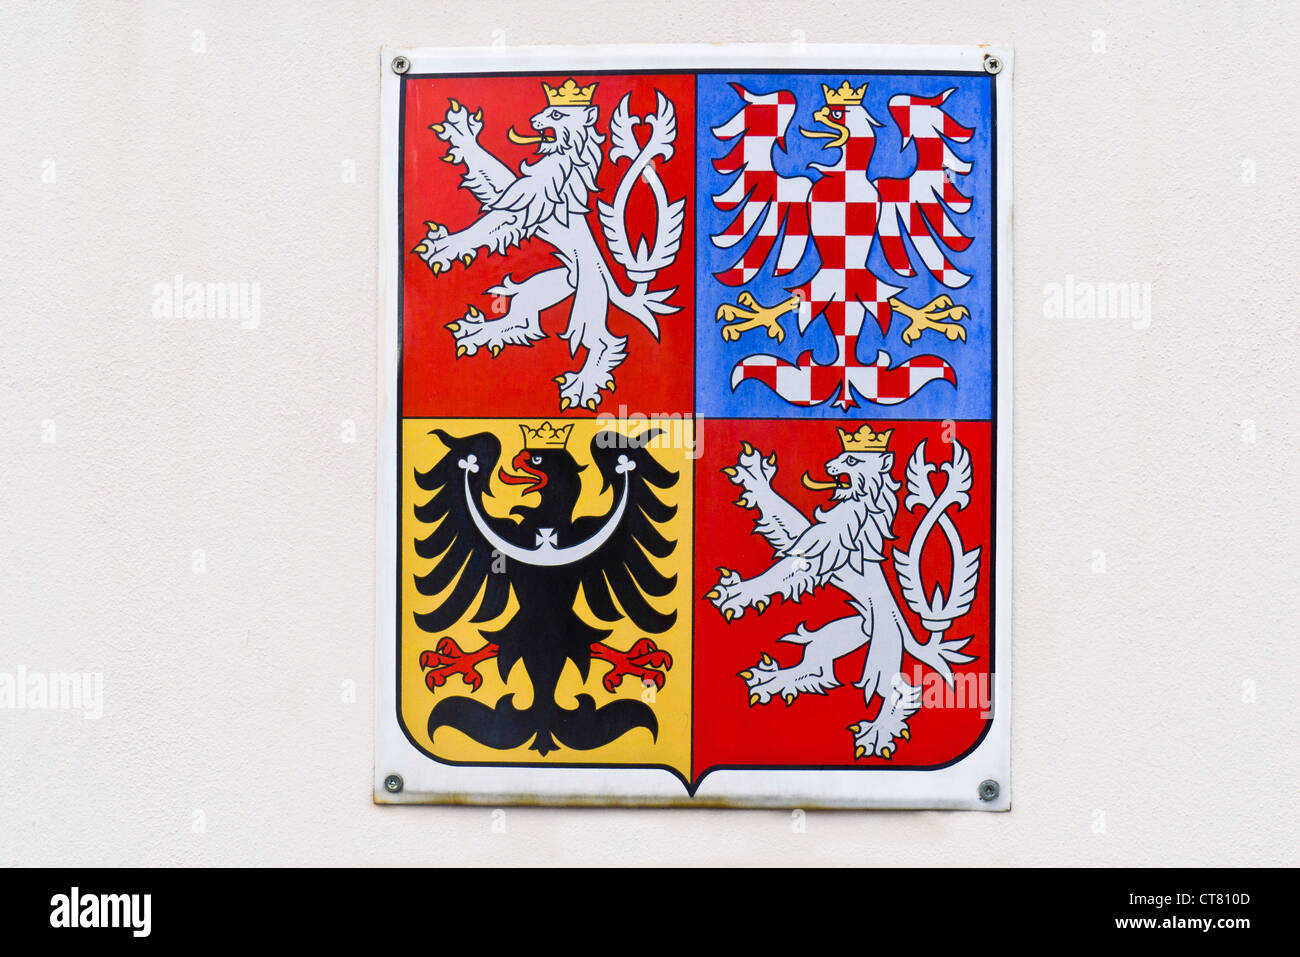 Heraldic symbols of the Czech Republic and Moravia - Stock Image